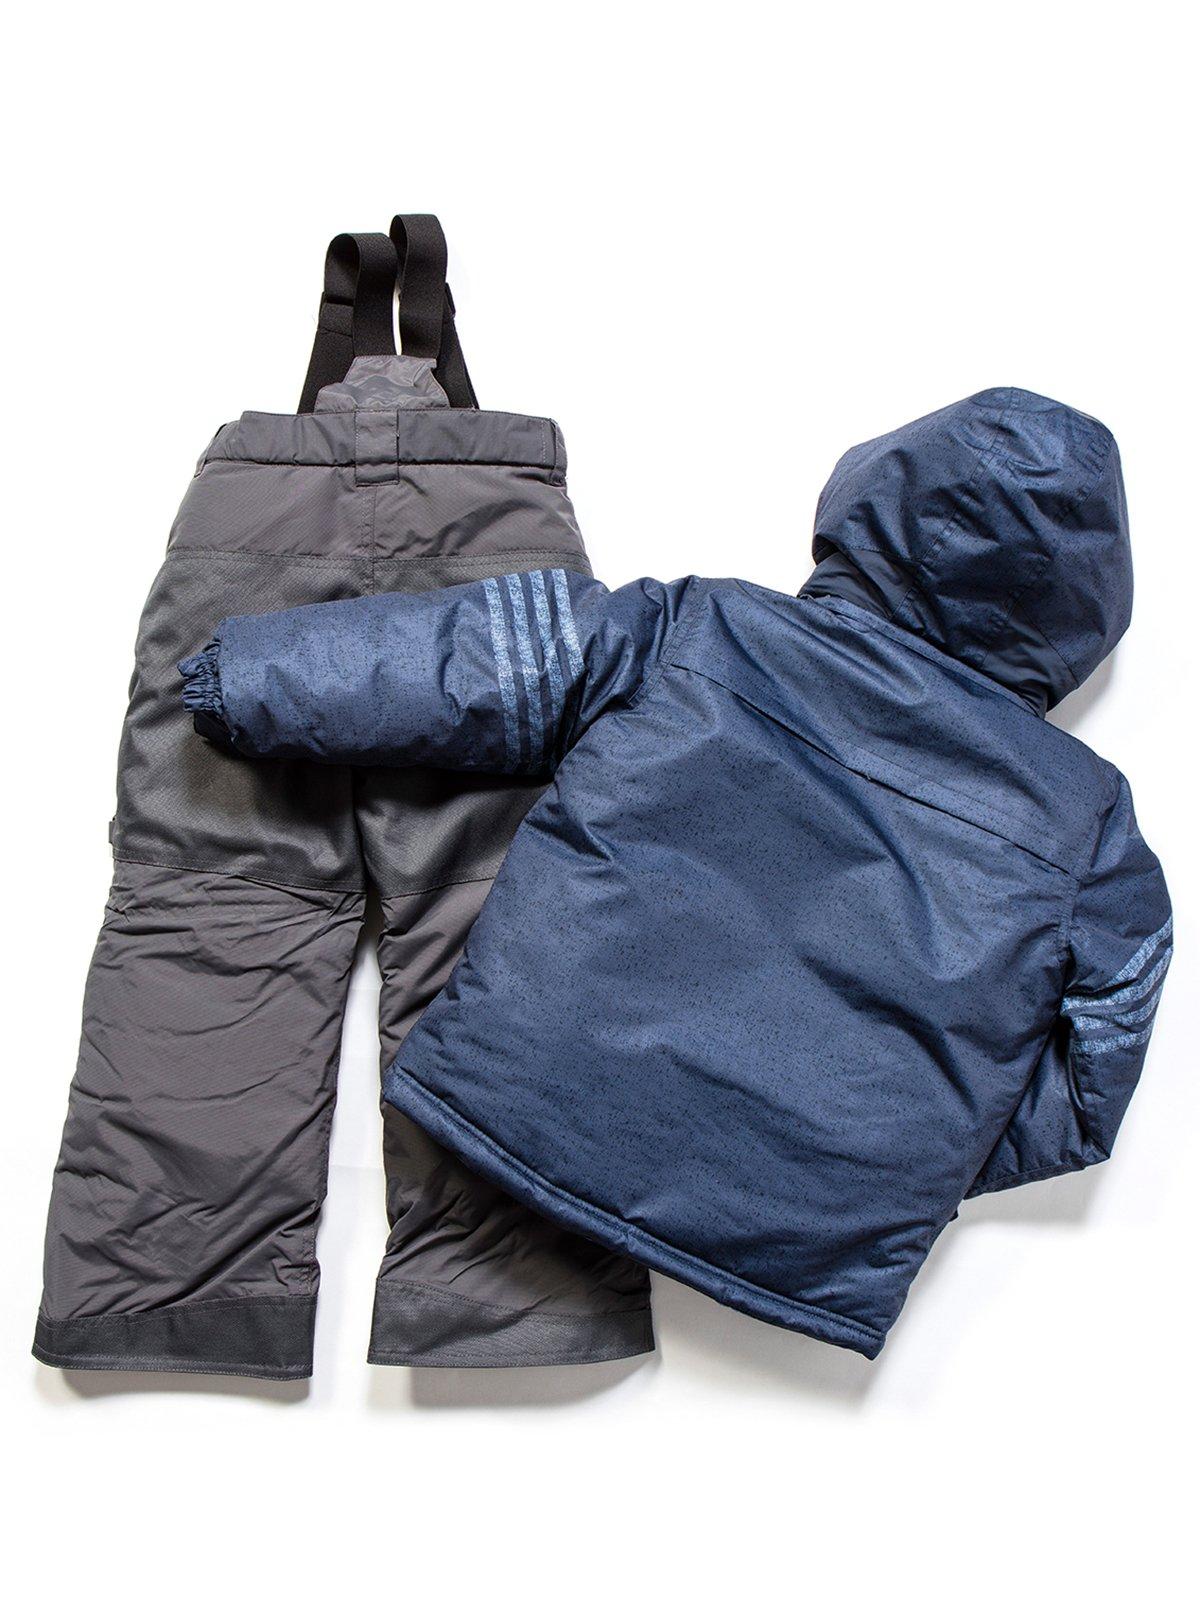 Комплект: куртка и полукомбинезон   3670922   фото 2